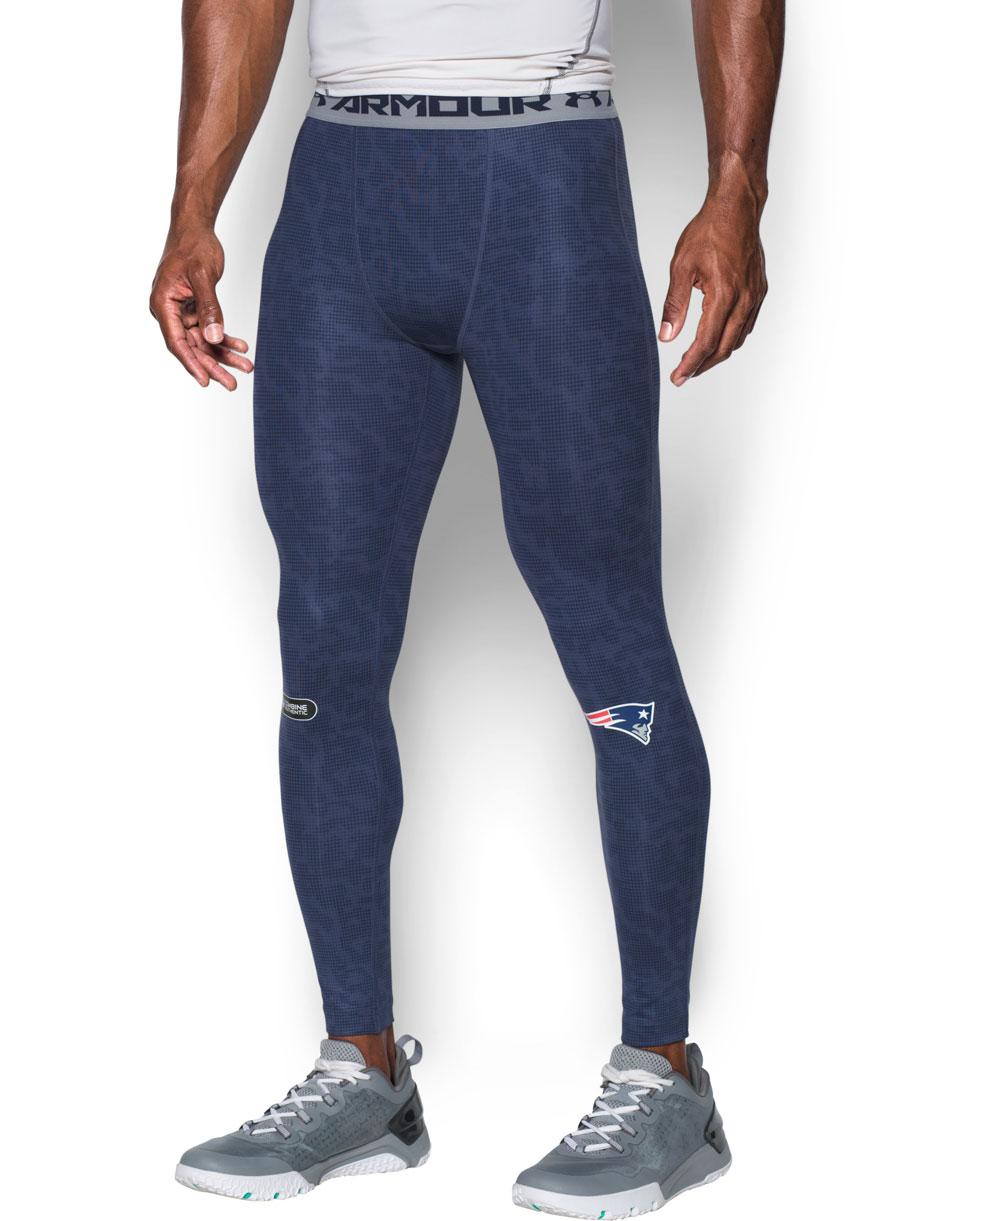 NFL Combine Authentic HeatGear Armour Men's Leggings New England Patriots